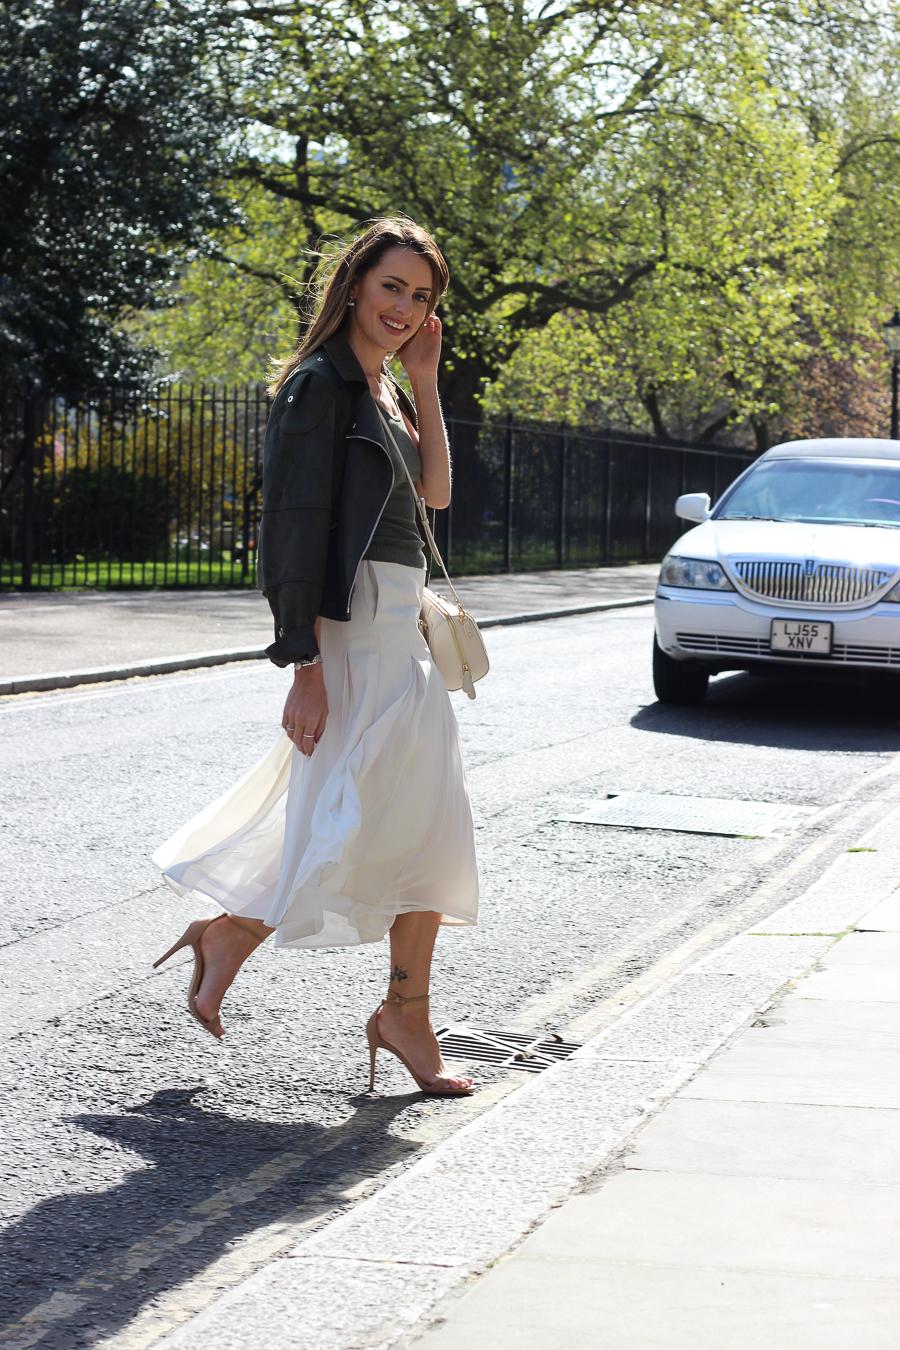 Folli Follie UK - Clutch and carry on - uk travel blogger, uk fashion blogger, london street style, sabrina chakici tblogger-38